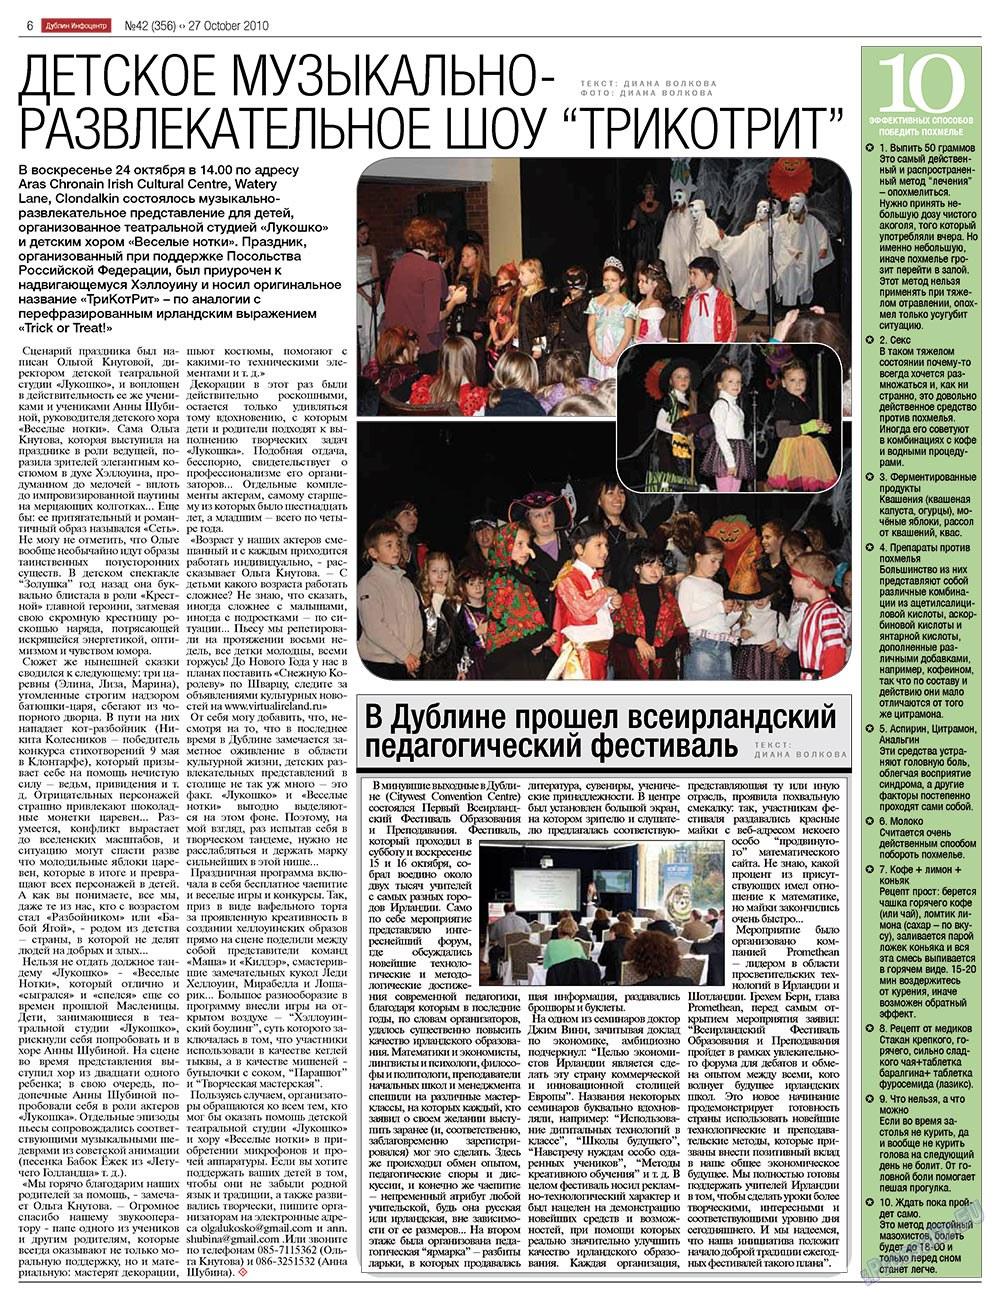 Дублин инфоцентр (газета). 2010 год, номер 42, стр. 6